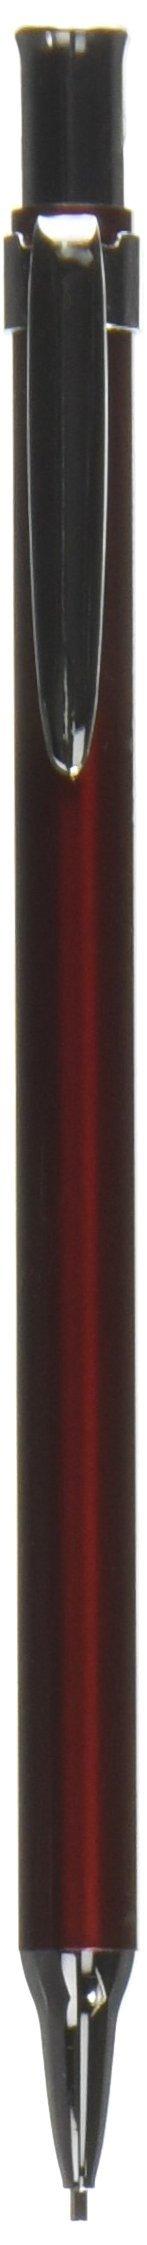 Pilot Portaminas Mini, 0,5 mm, color azul oscuro...